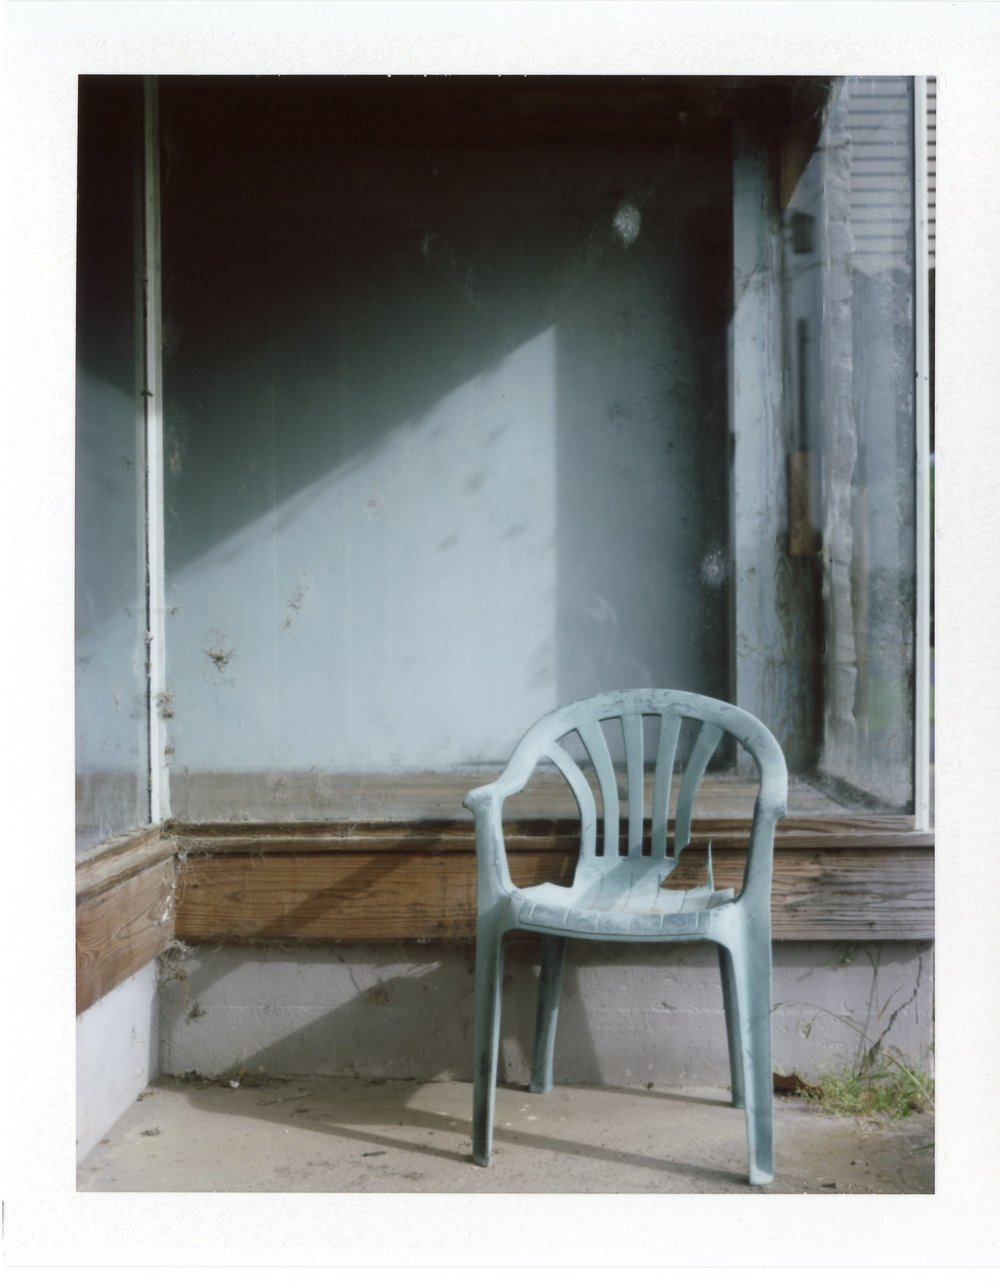 Anytown USA | Polaroid110a | Fuji FP100c | Michael Mooney